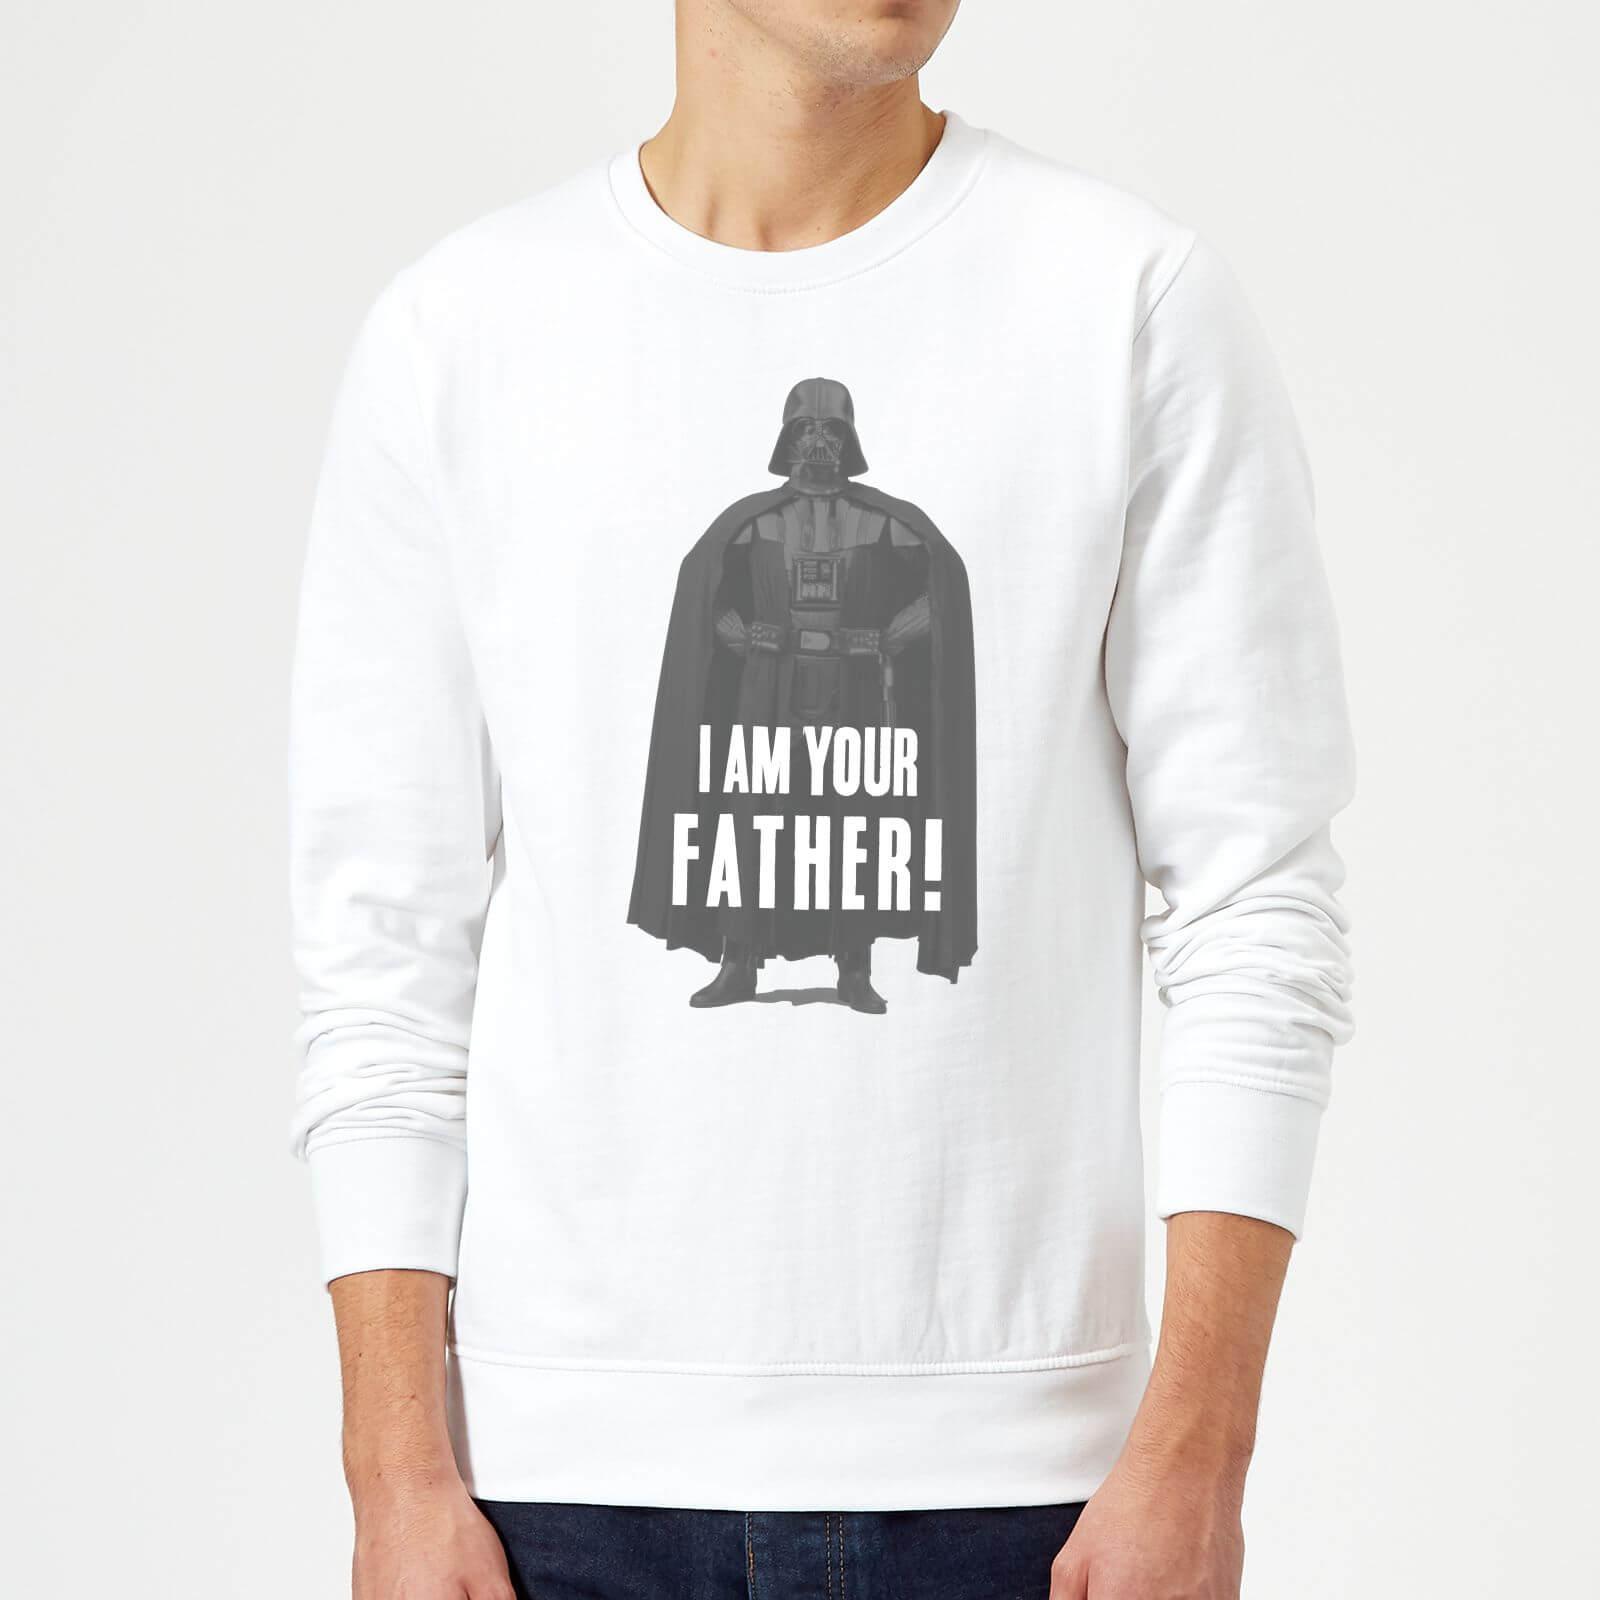 OfferteWeb.click 27-felpa-star-wars-darth-vader-i-am-your-father-pose-bianco